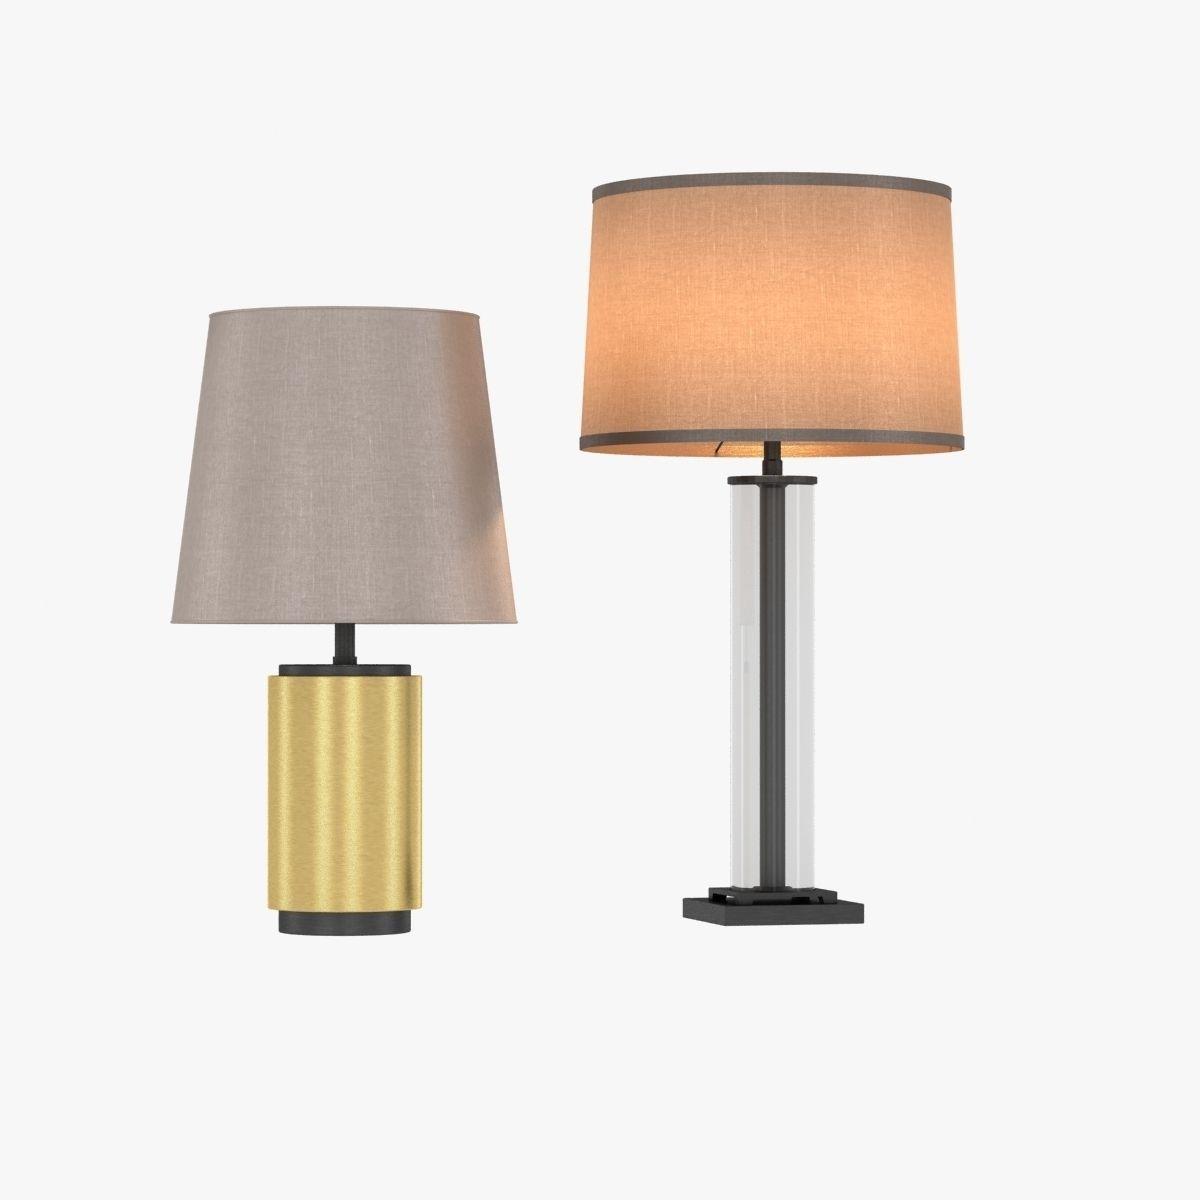 Restoration Hardware French Column Glass Table Lamp 3d Model Max Obj